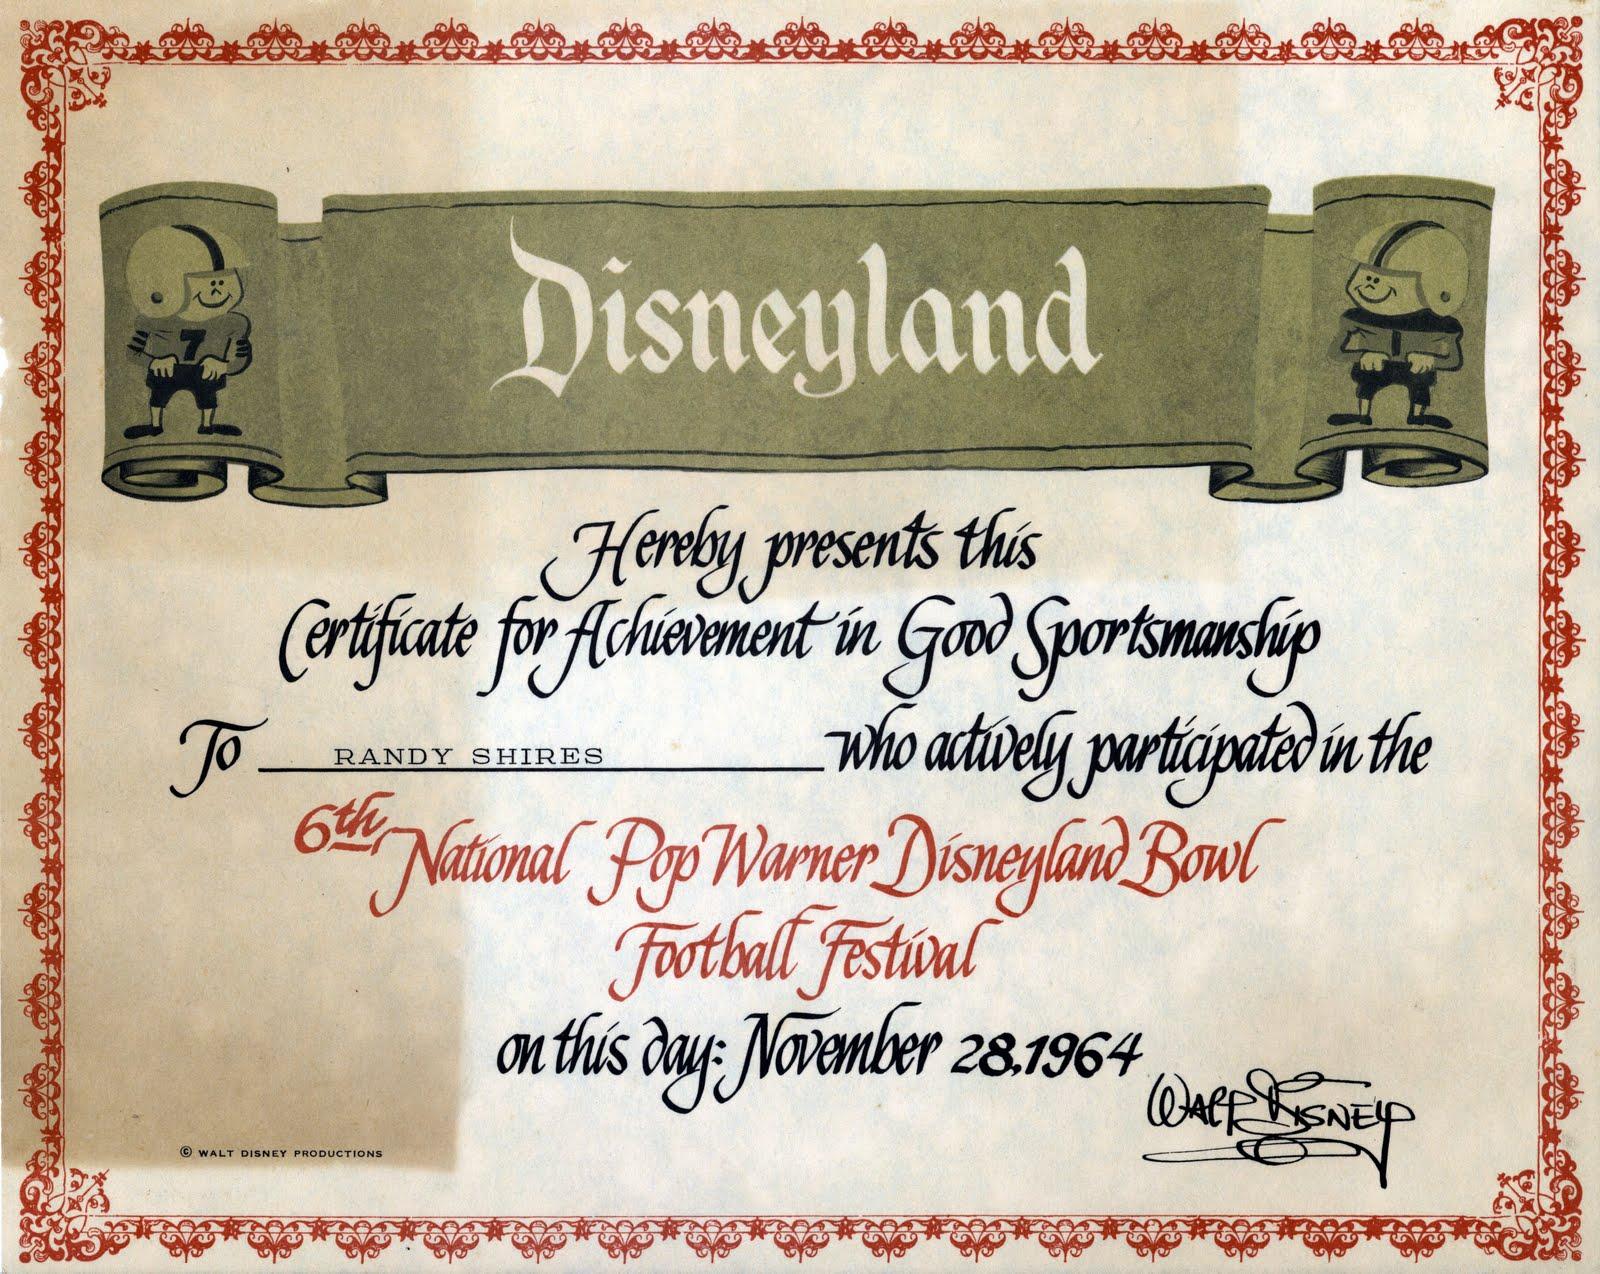 Vintage Disneyland Tickets: Disneyland - Pop Warner, November 28, 1964